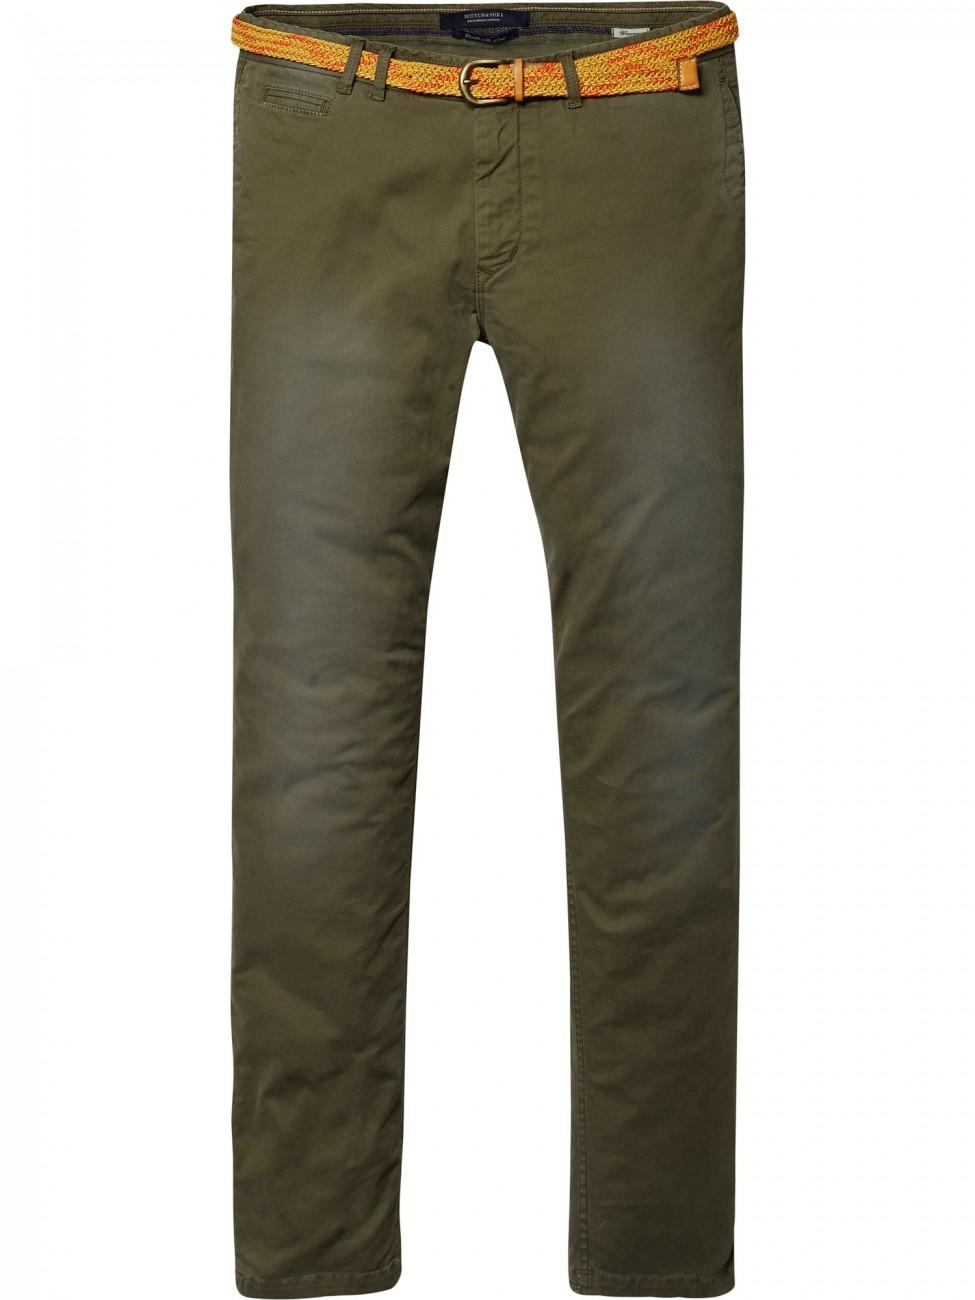 Scotch & Soda Herren Chino Hose Garment Dyed - Slim Fit - Grün - Military